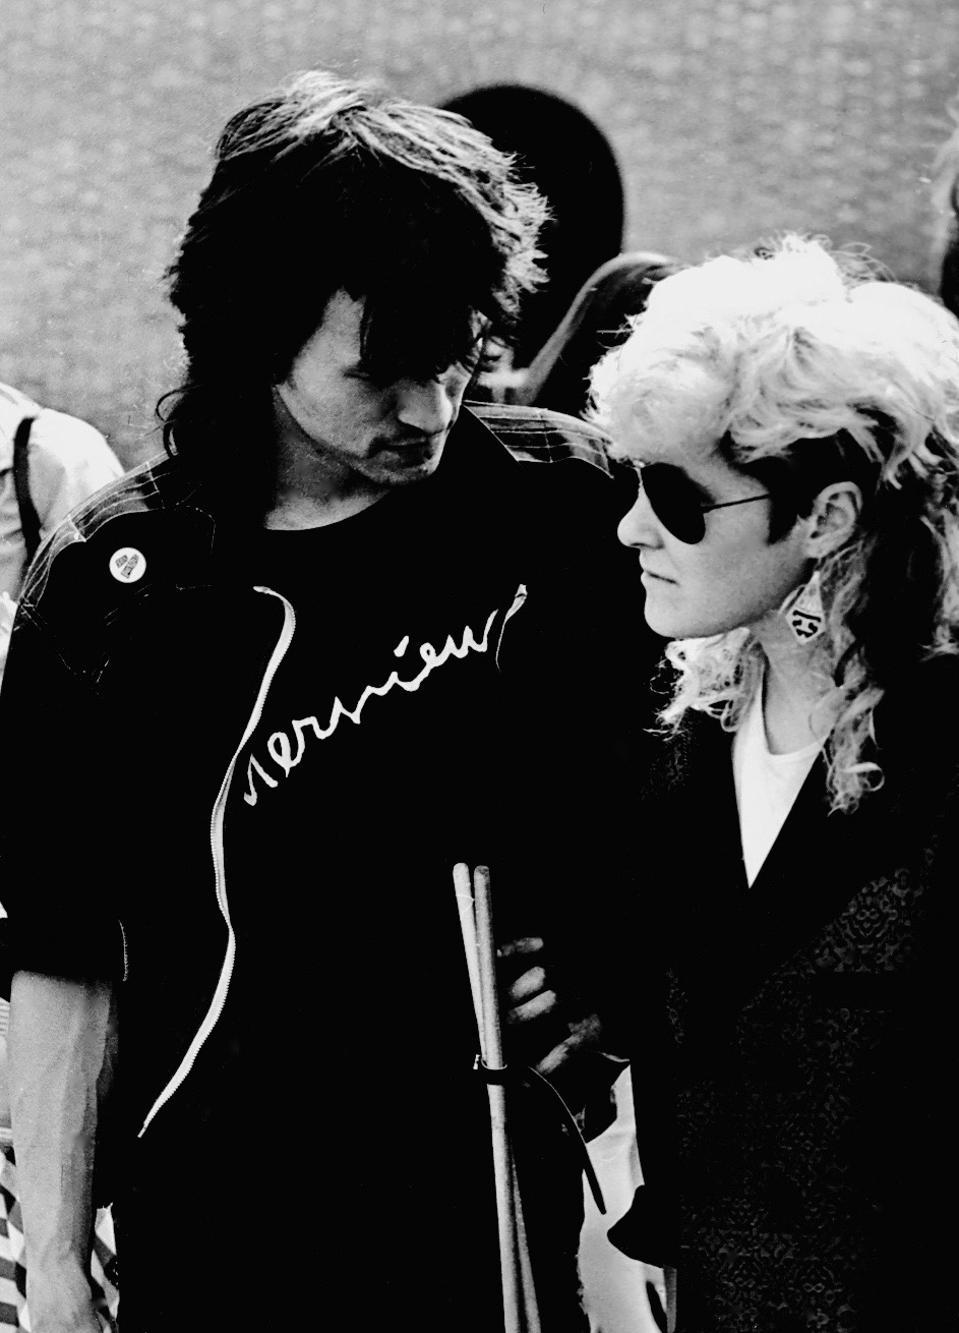 Viktor Tsoi and Joanna Stingray in Leningrad in 1986.